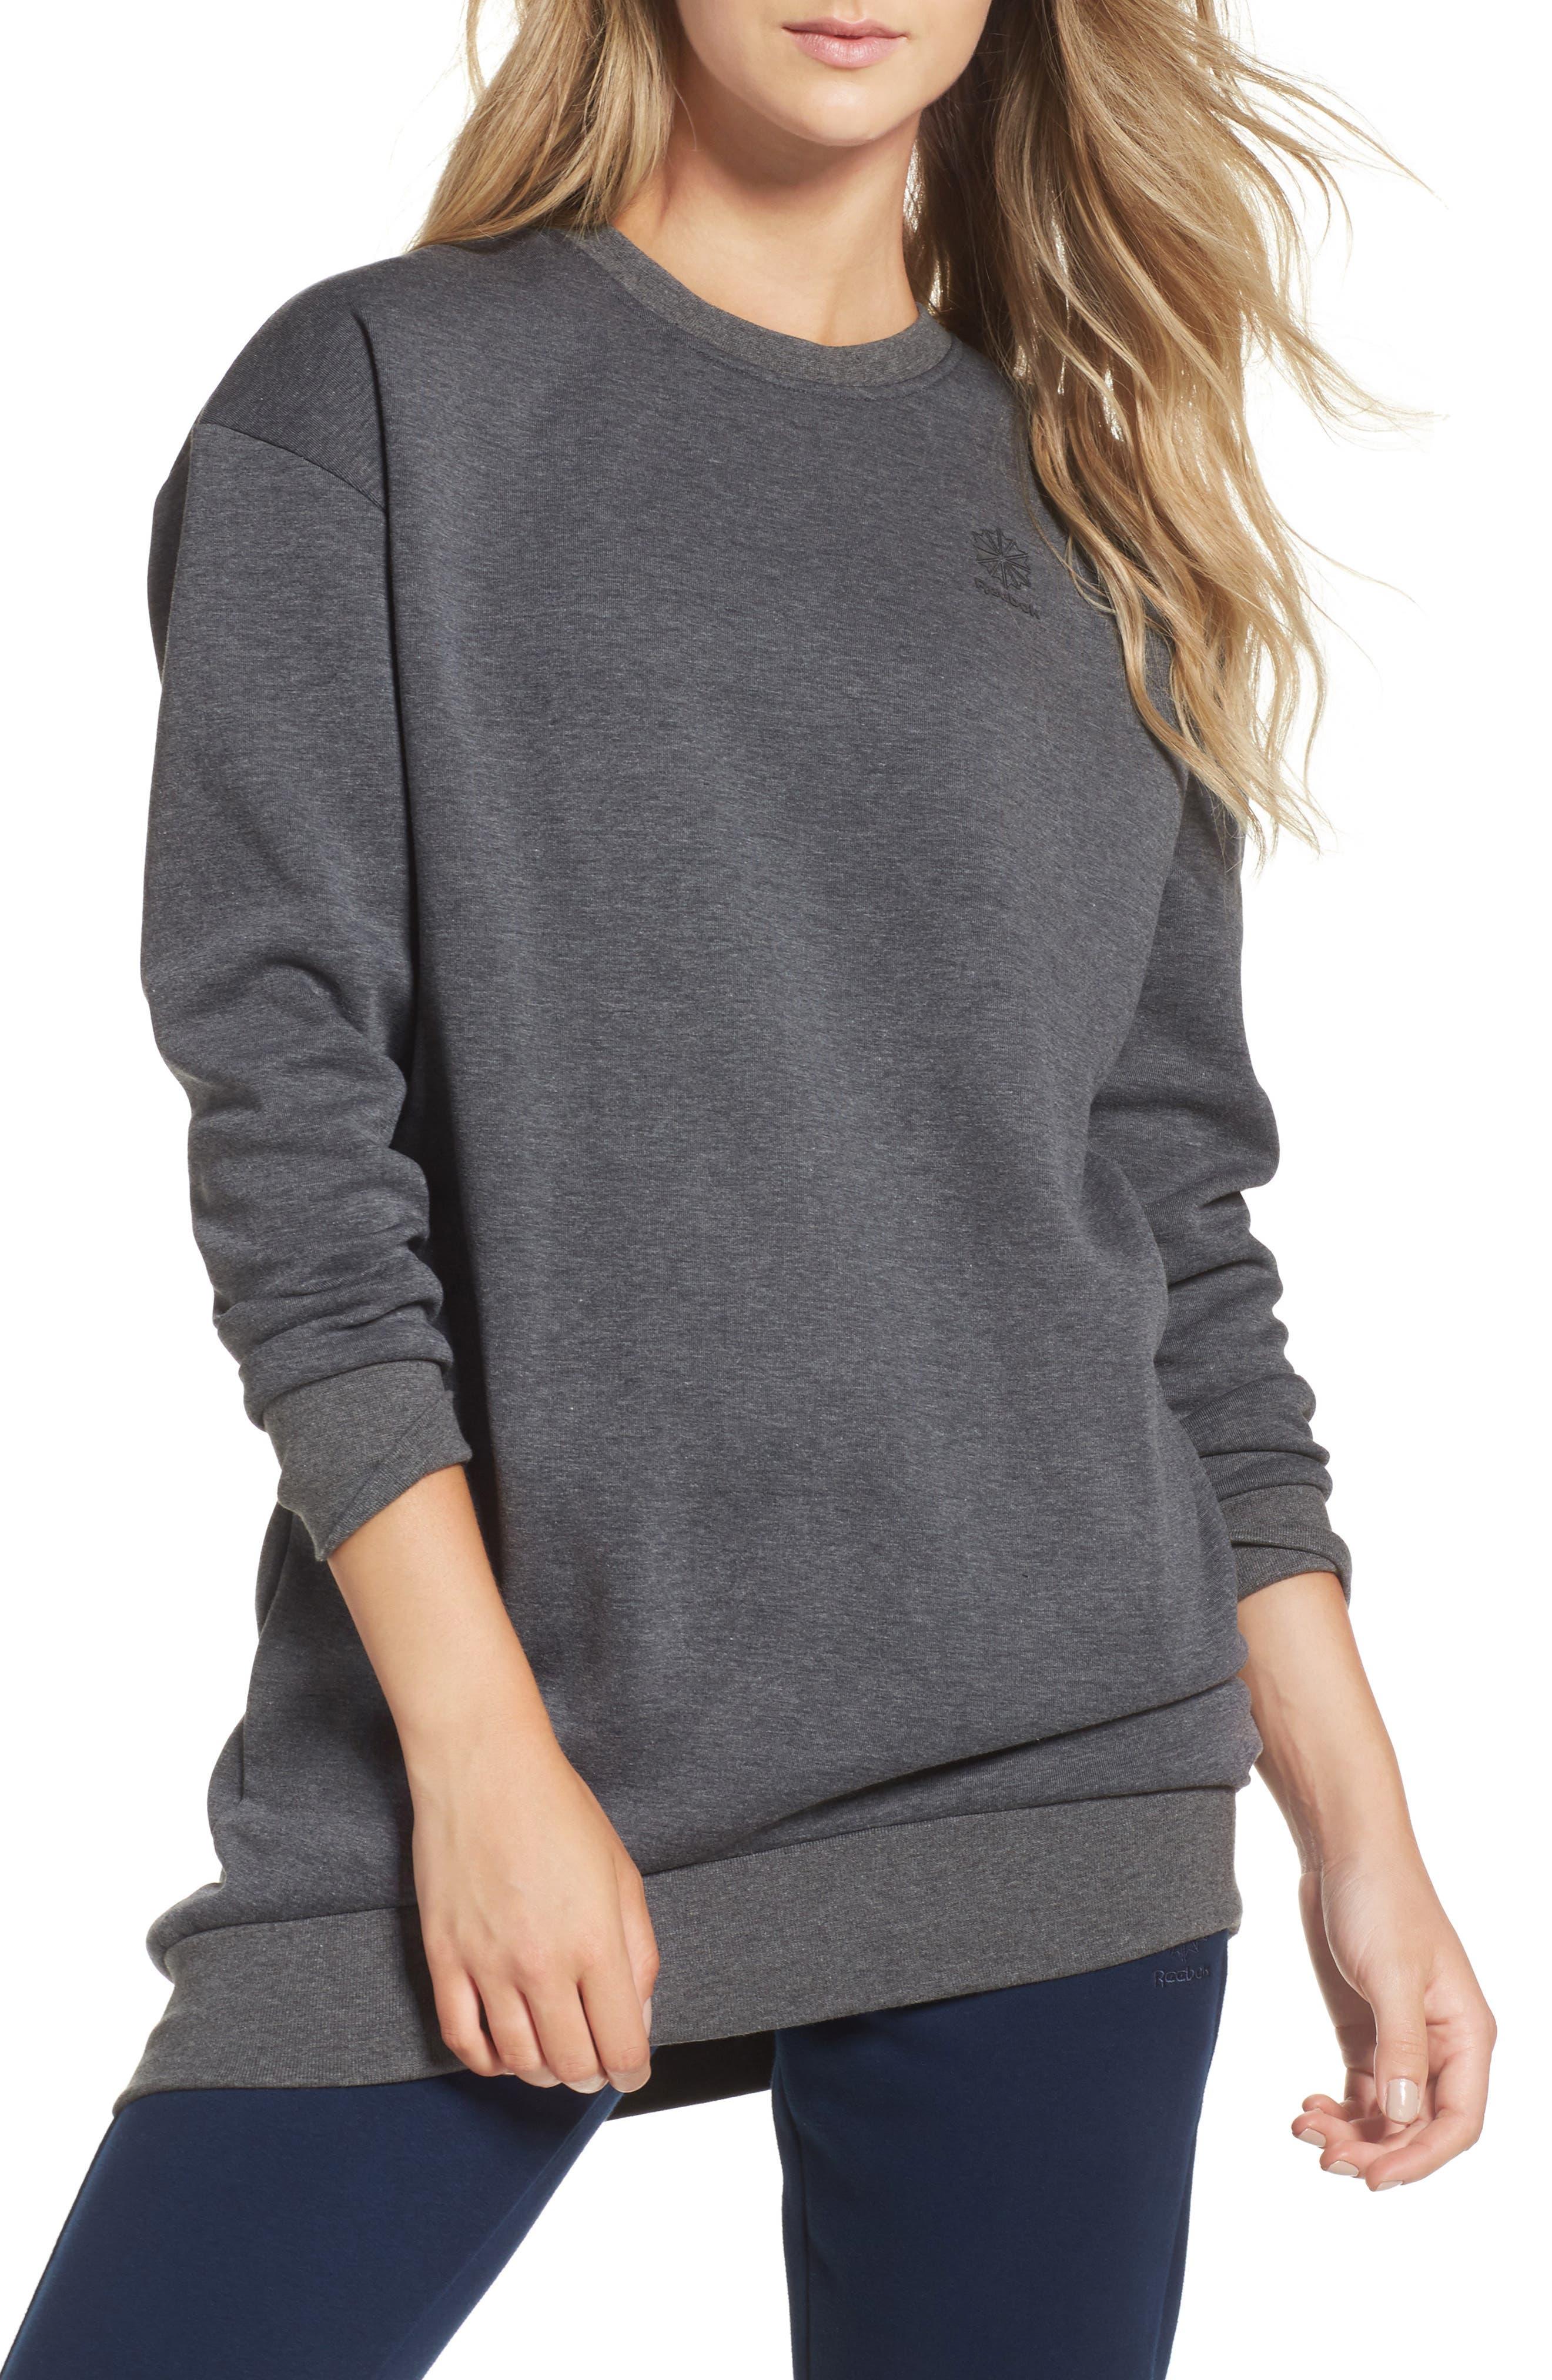 Oversize Sweatshirt,                             Main thumbnail 1, color,                             Dark Grey Heather